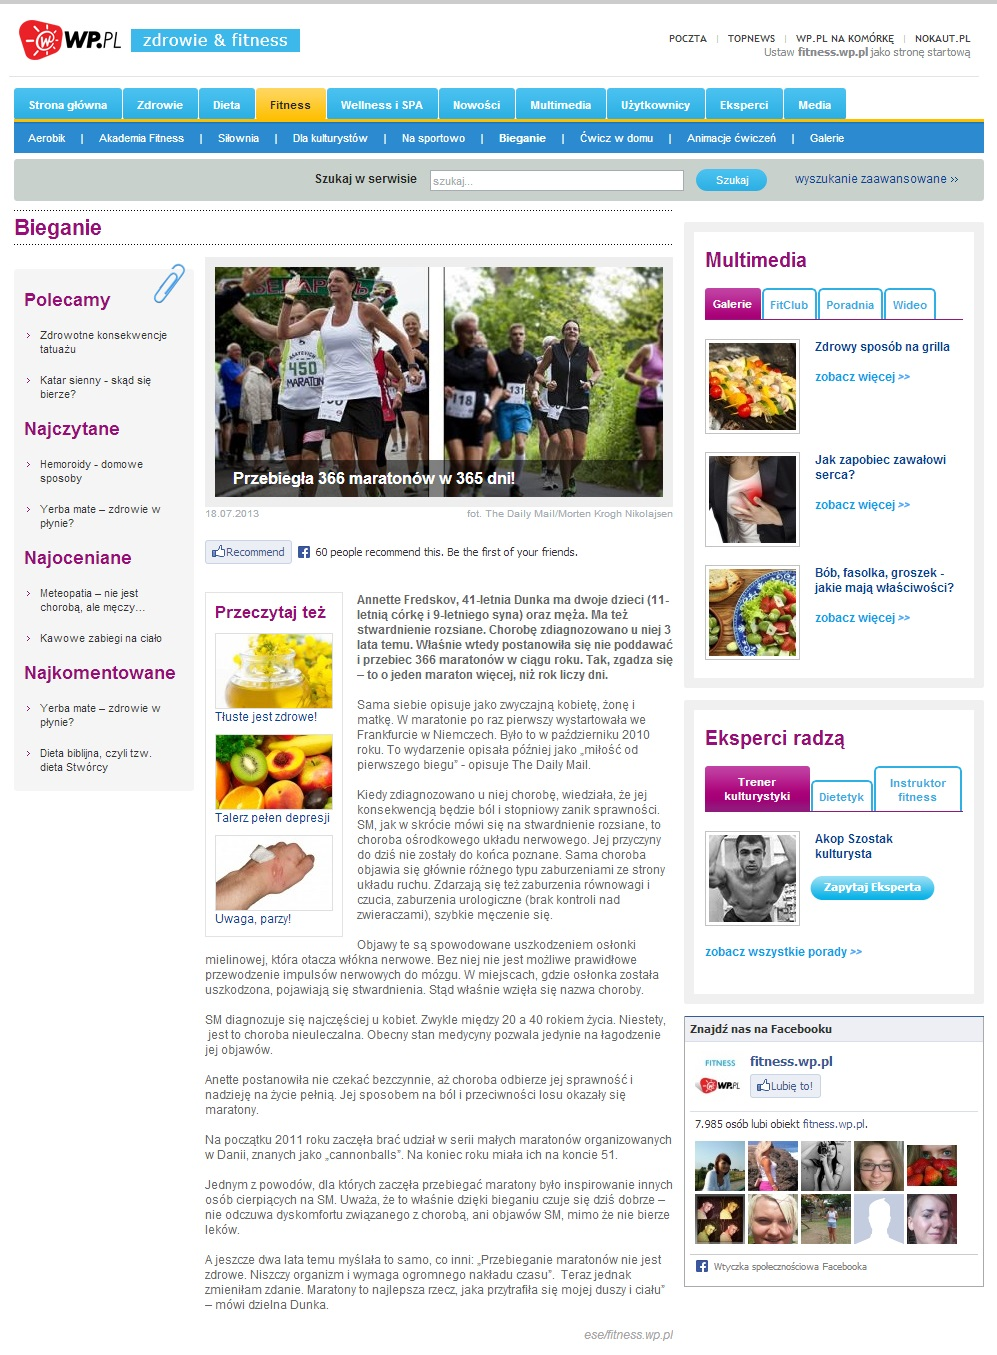 fitness.wp.pl 2013.07.18 polsk